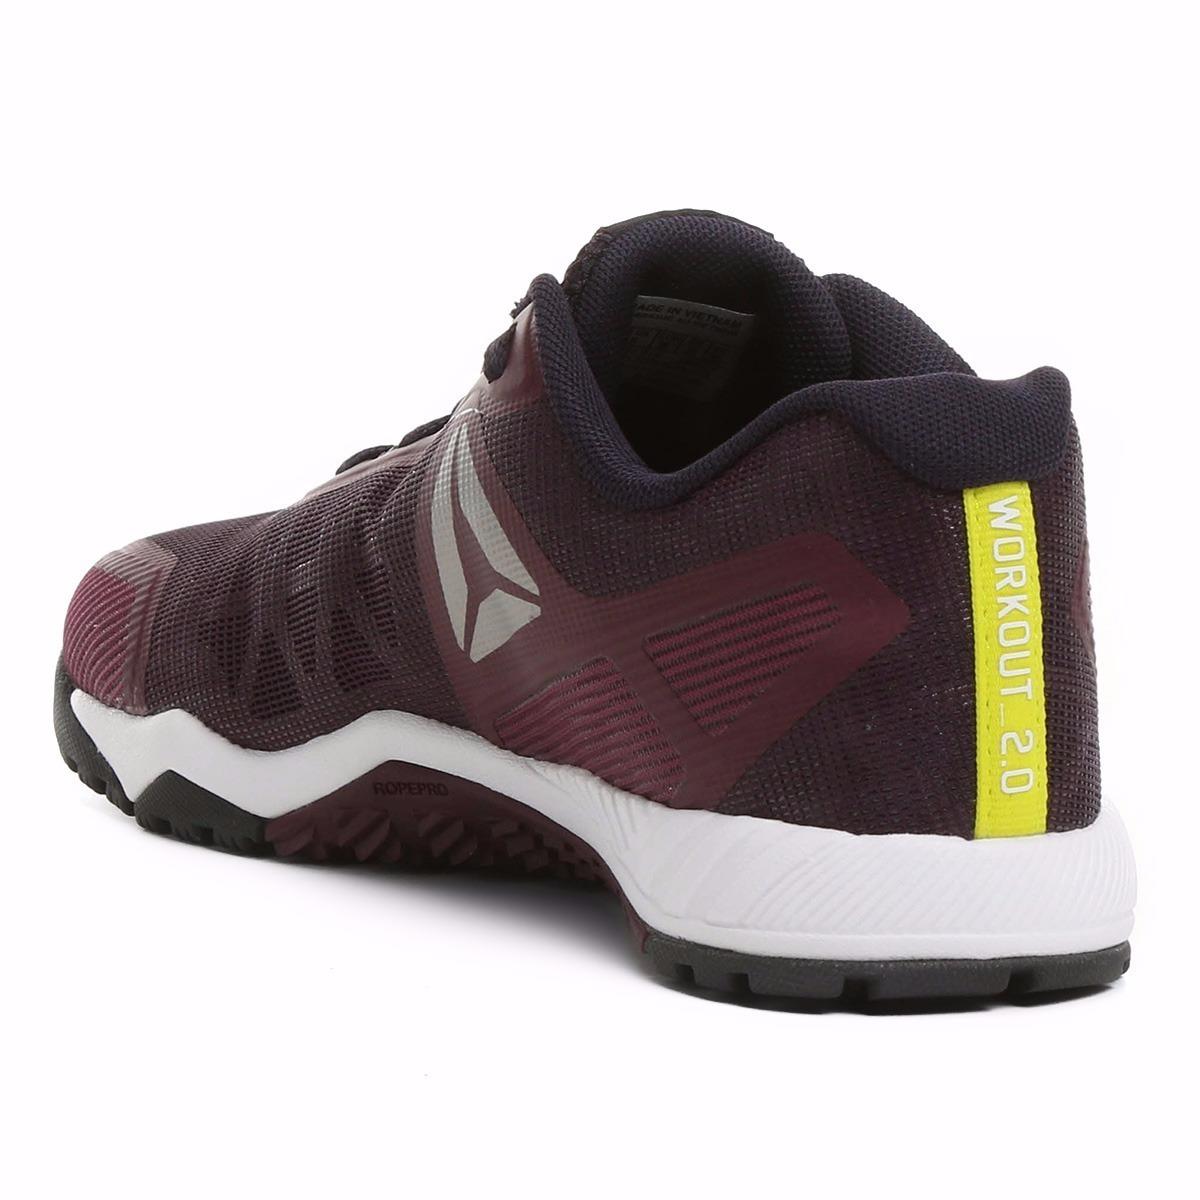 tênis reebok ros workout tr 2.0 feminino crossfit nano vinho. Carregando  zoom. 1058ee51553b3